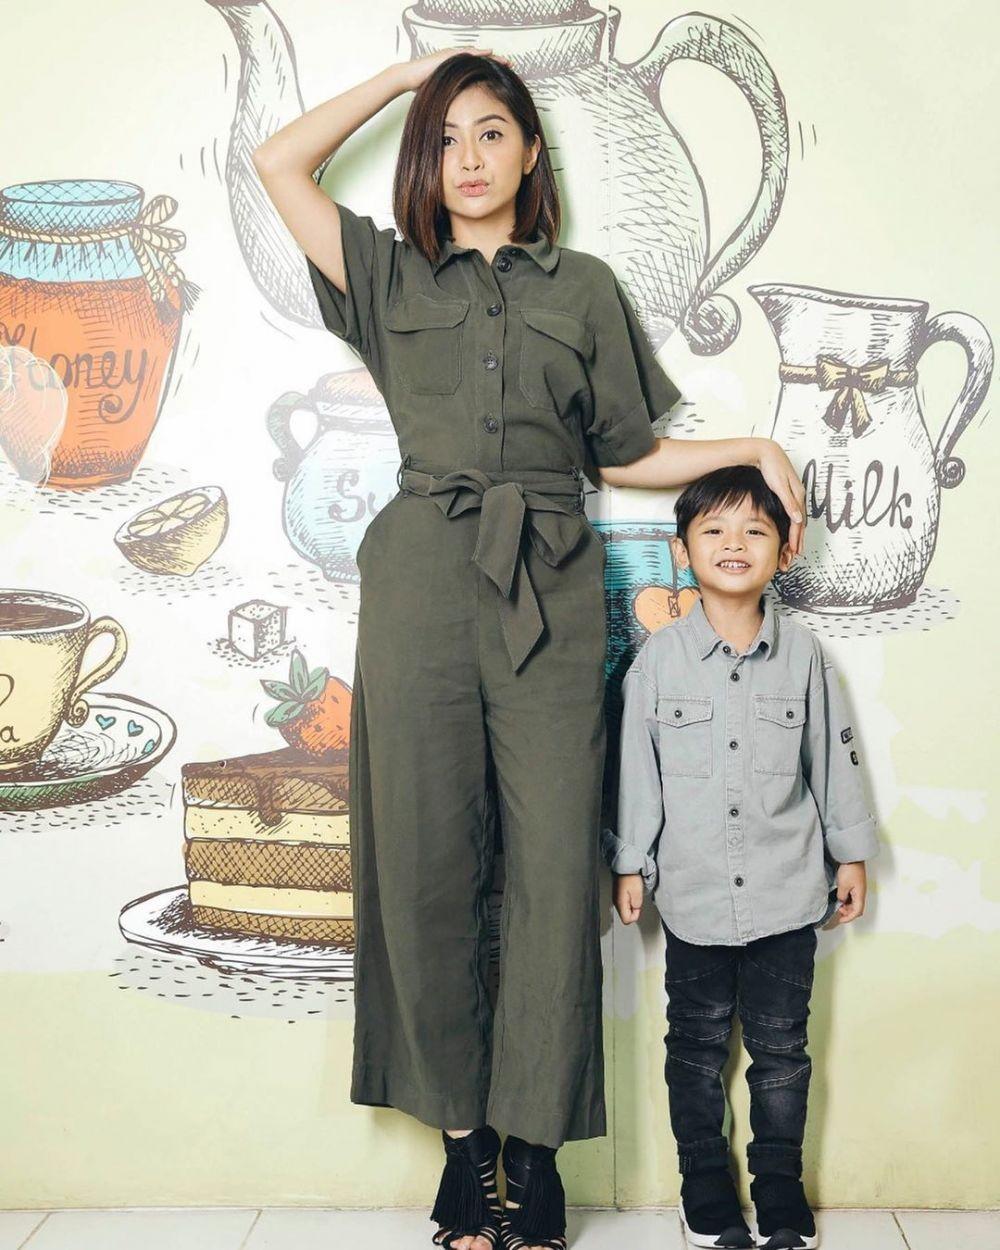 Wanita Super Tangguh! 10 Single Mom Artis Ini Inspiratif Banget